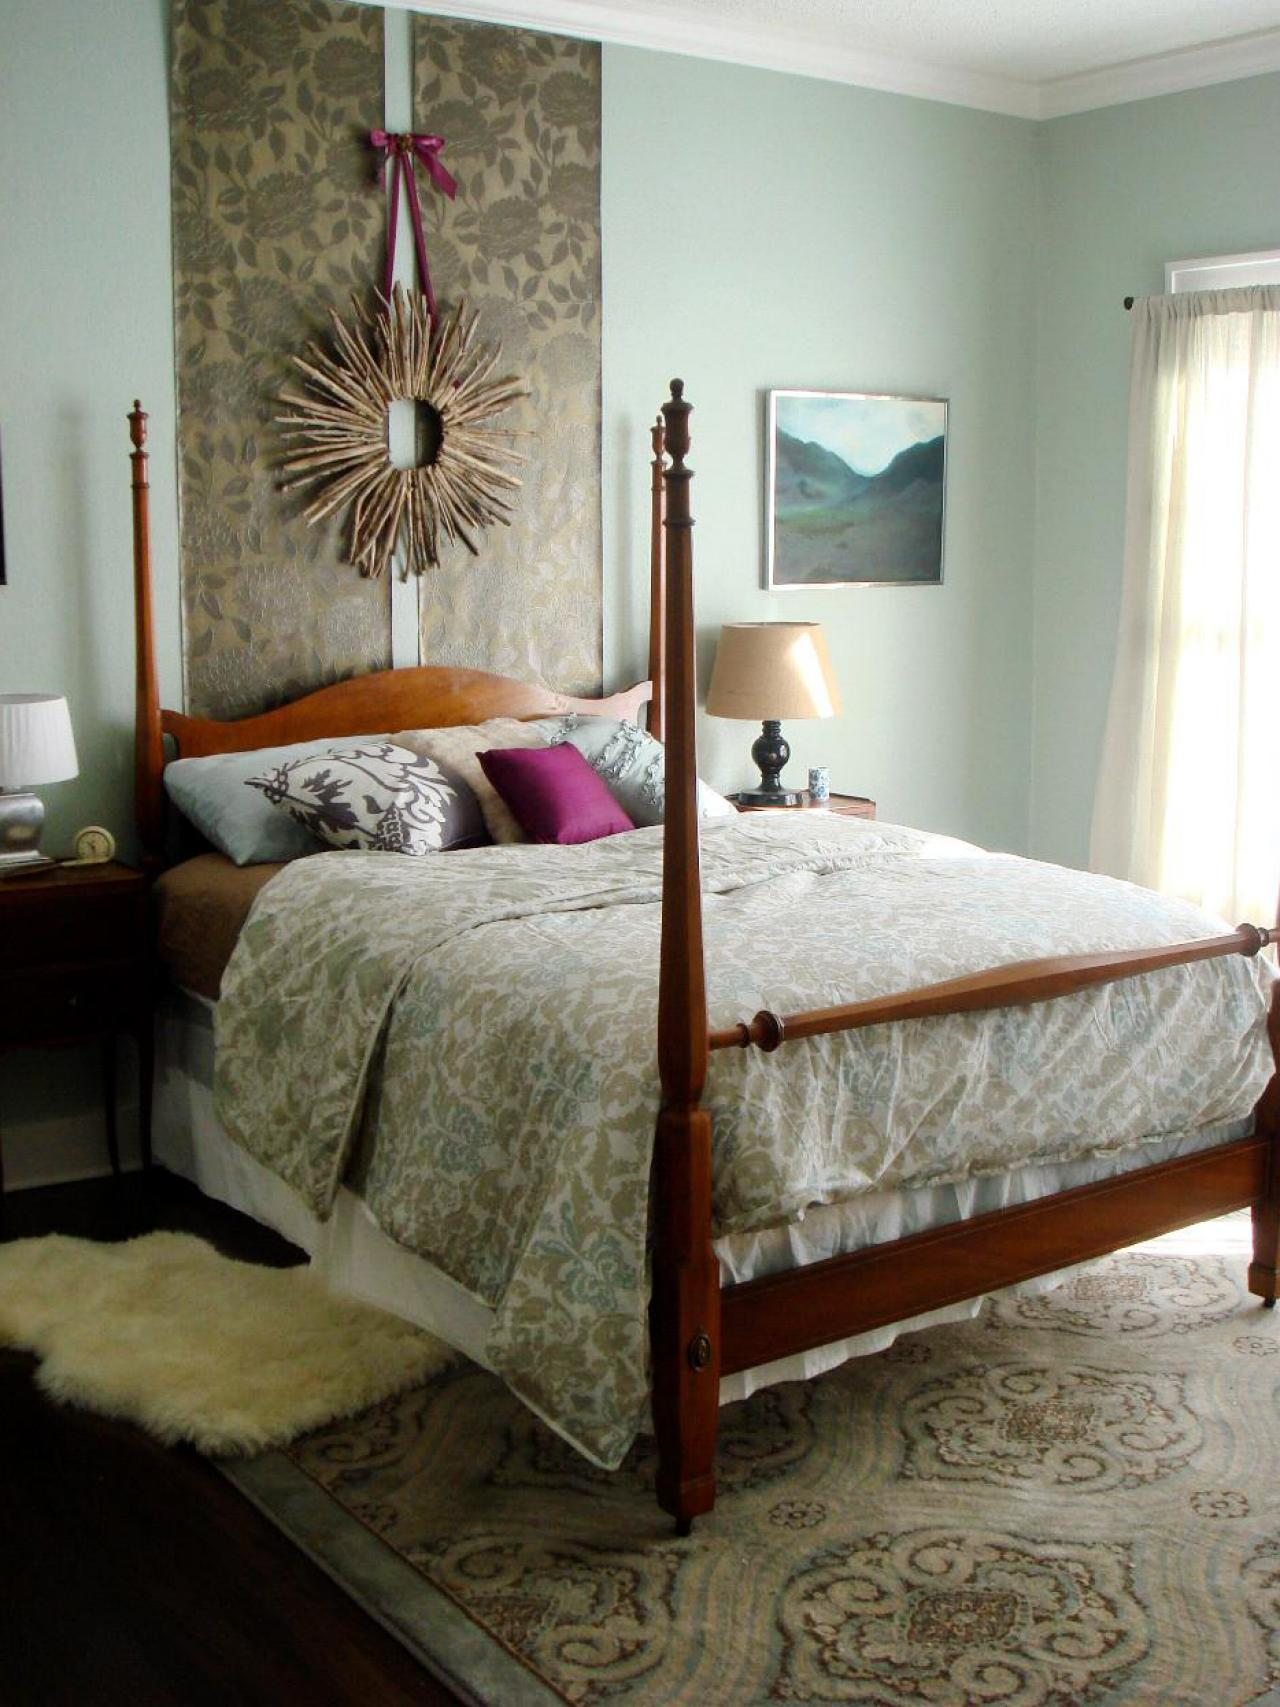 17 Budget Headboards Bedrooms Bedroom Decorating Ideas HGTV 1280x1707